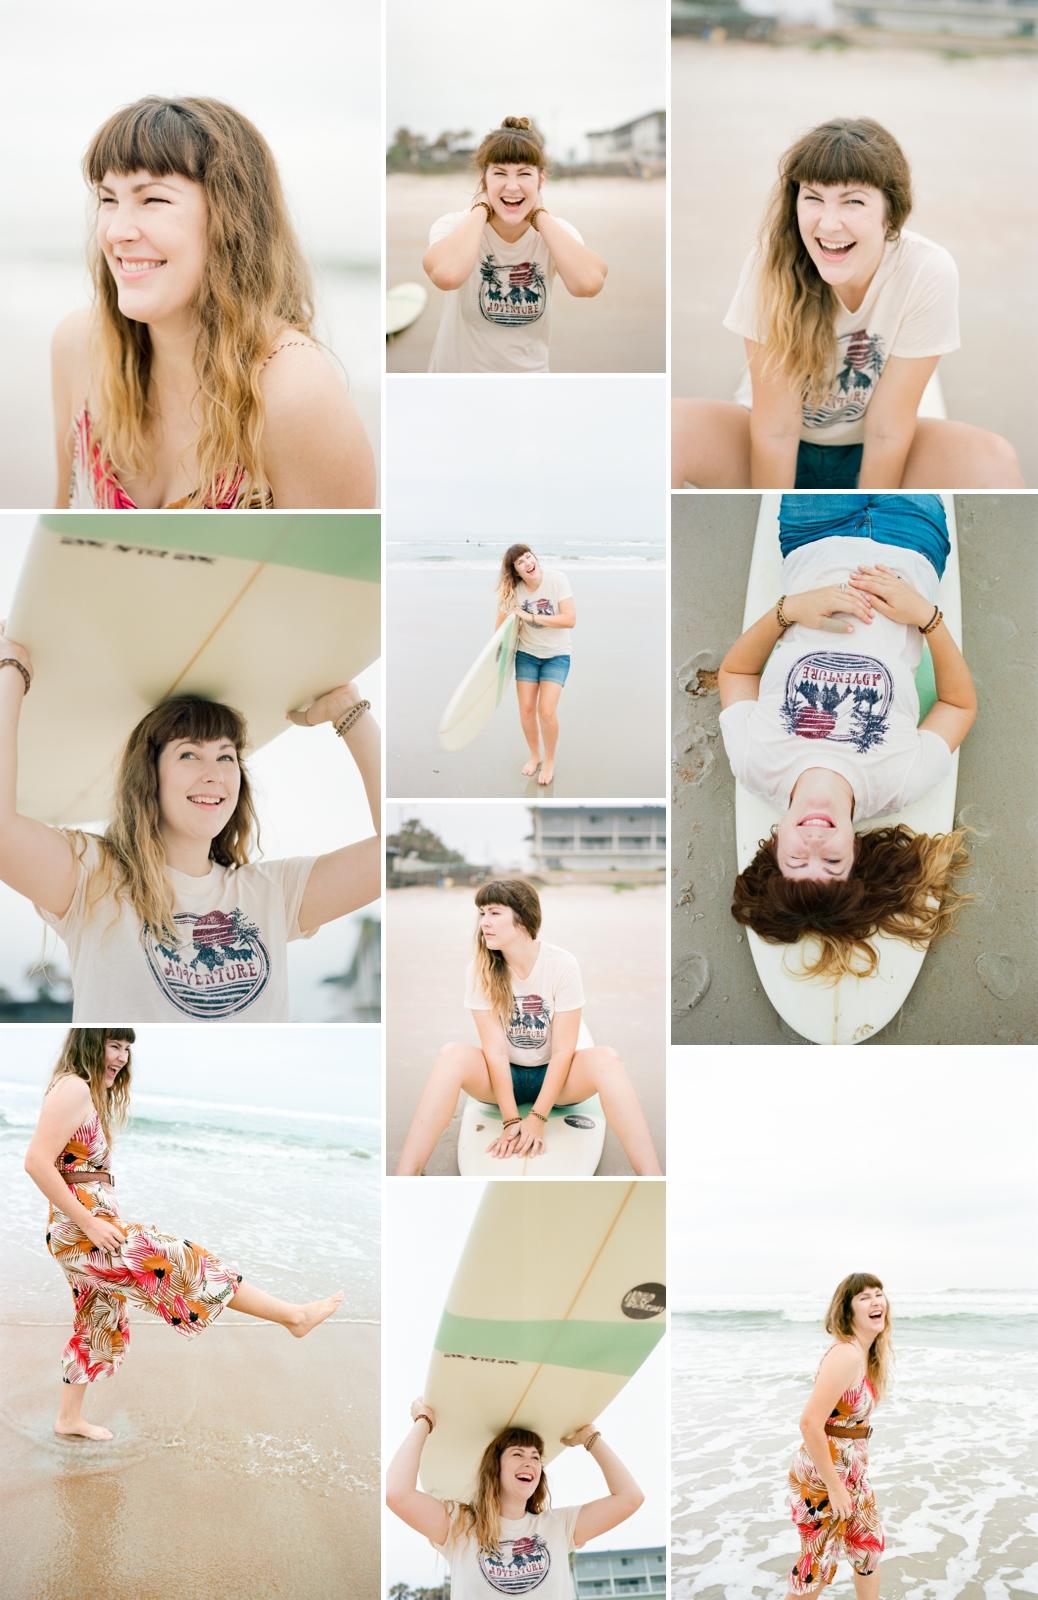 palm beach branding professional headshot photographer shannon griffin headshots_0031.jpg